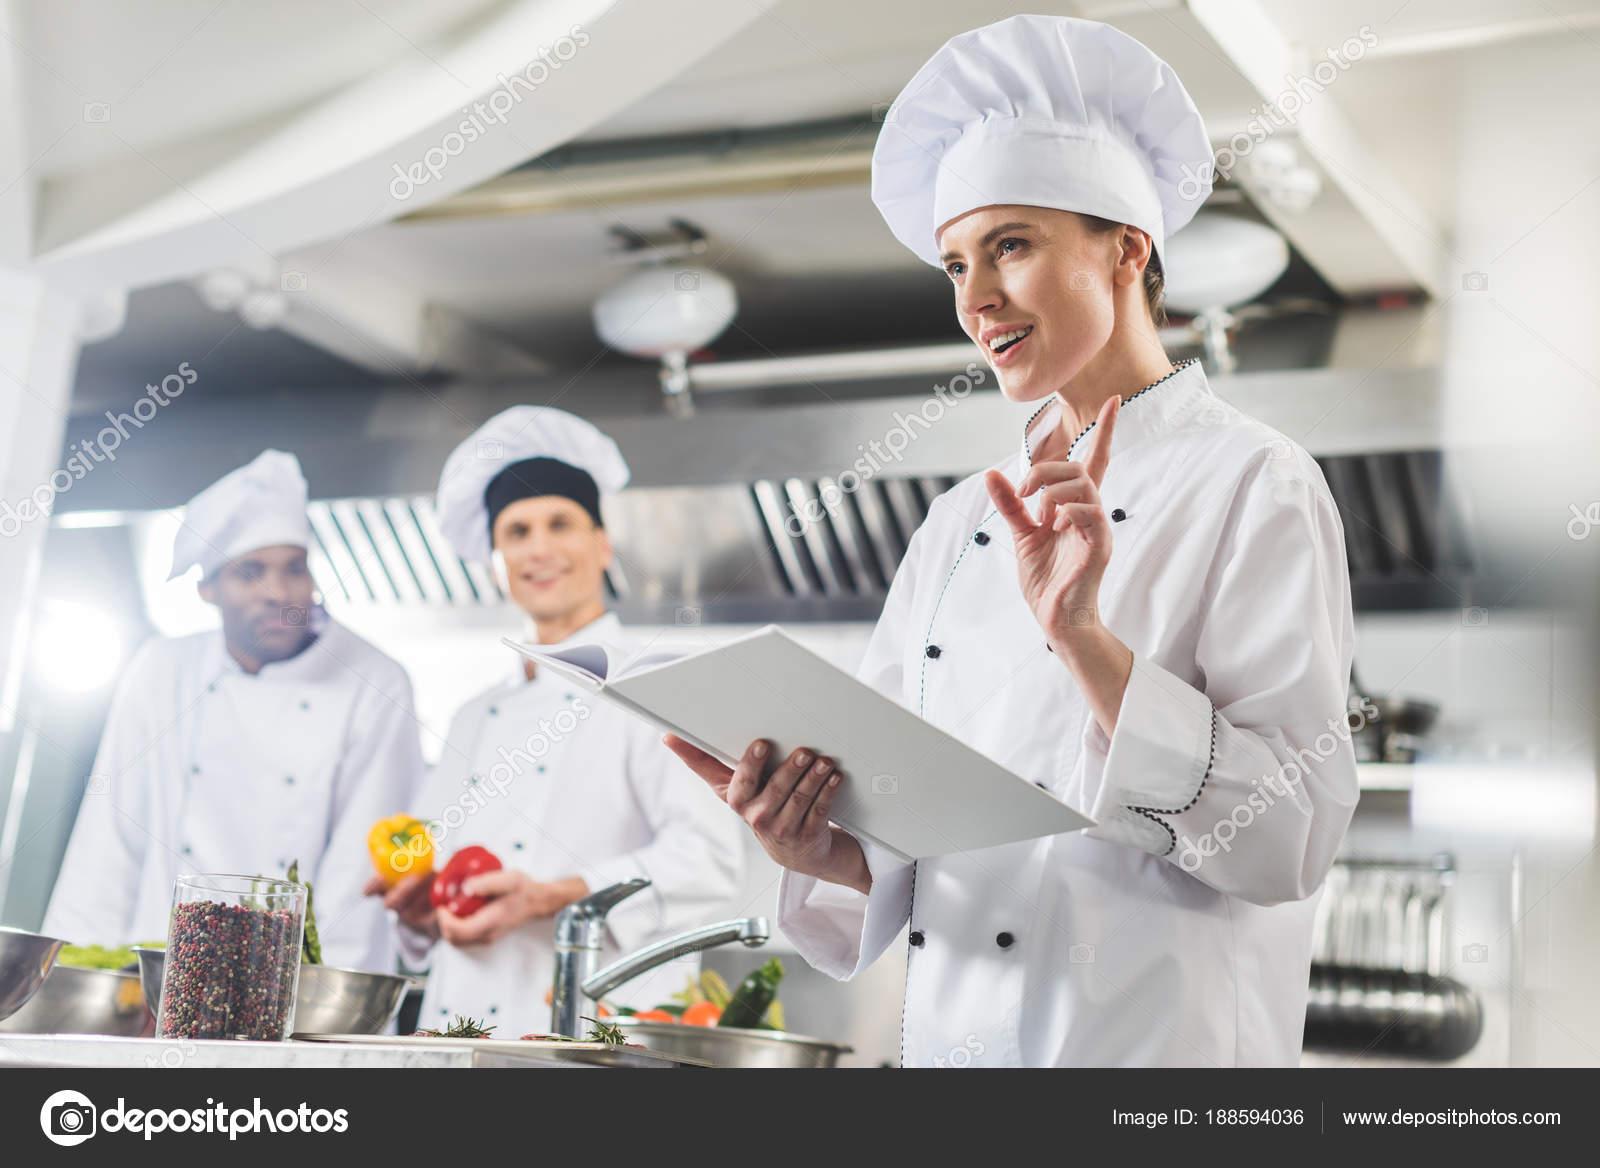 Seduisante Chef Tenant Livre Recettes Montrant Geste Idee